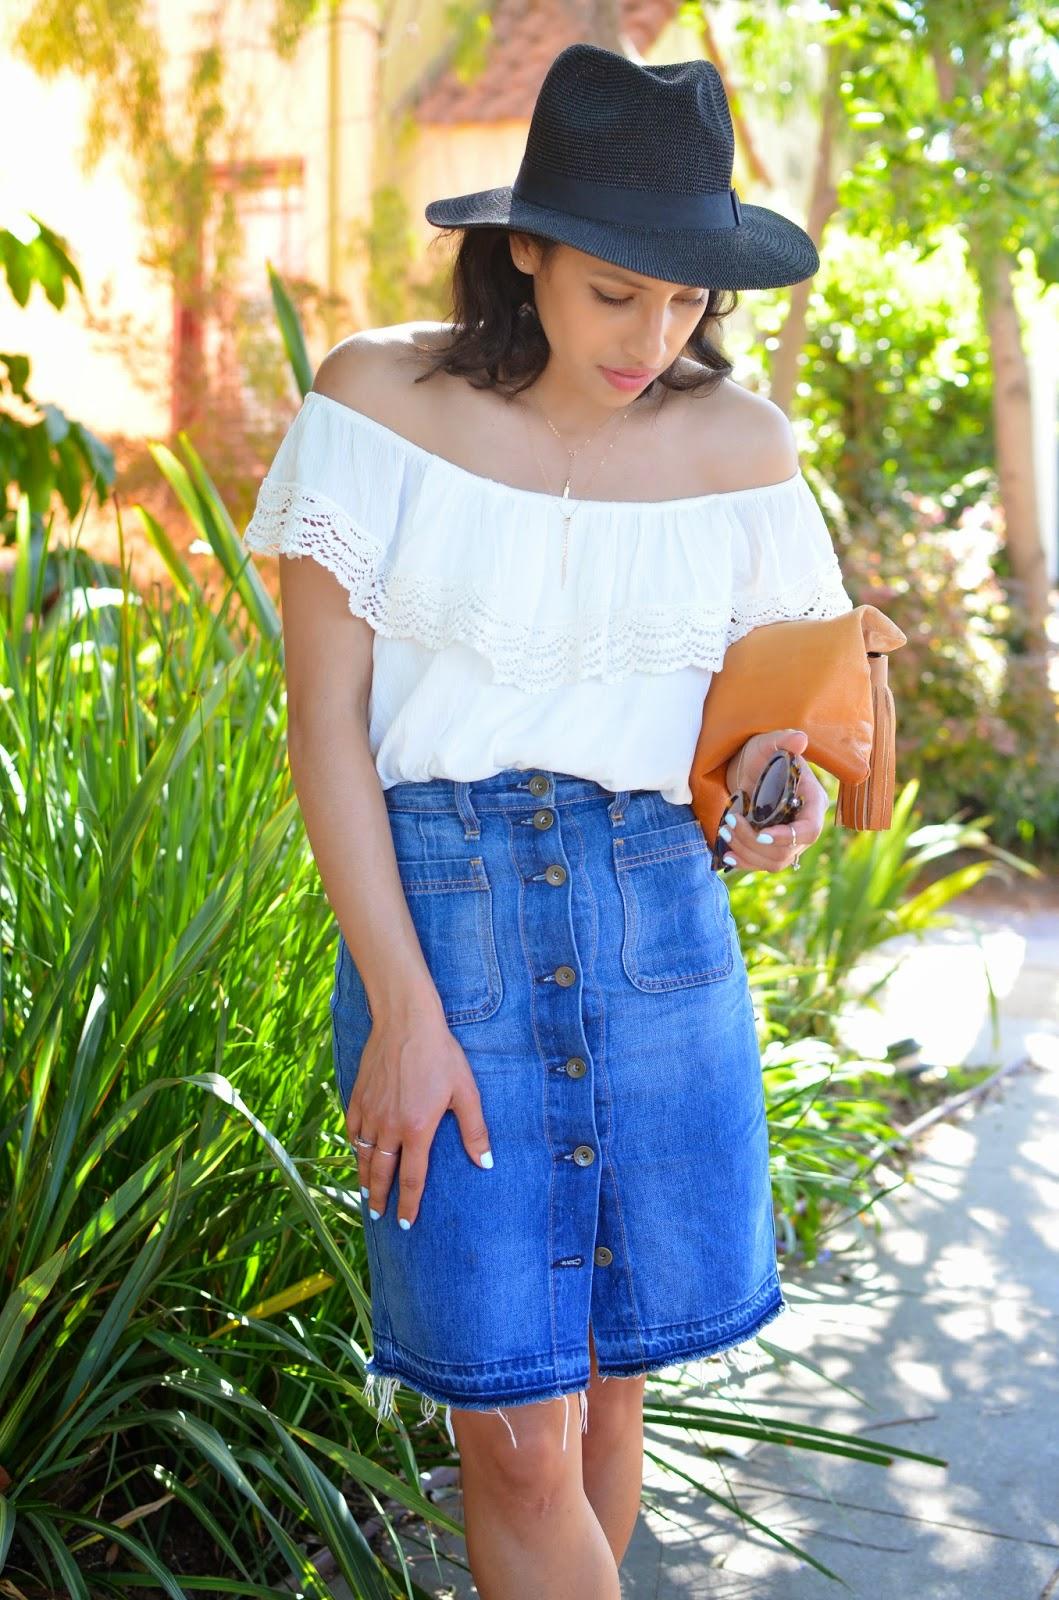 Rag & bone, denim high waisted skirt, denim skirt, off the shoulder top, spring style, Venice, Venice beach, LA, slide sandals, Matisse, DSW, black straw fedora,